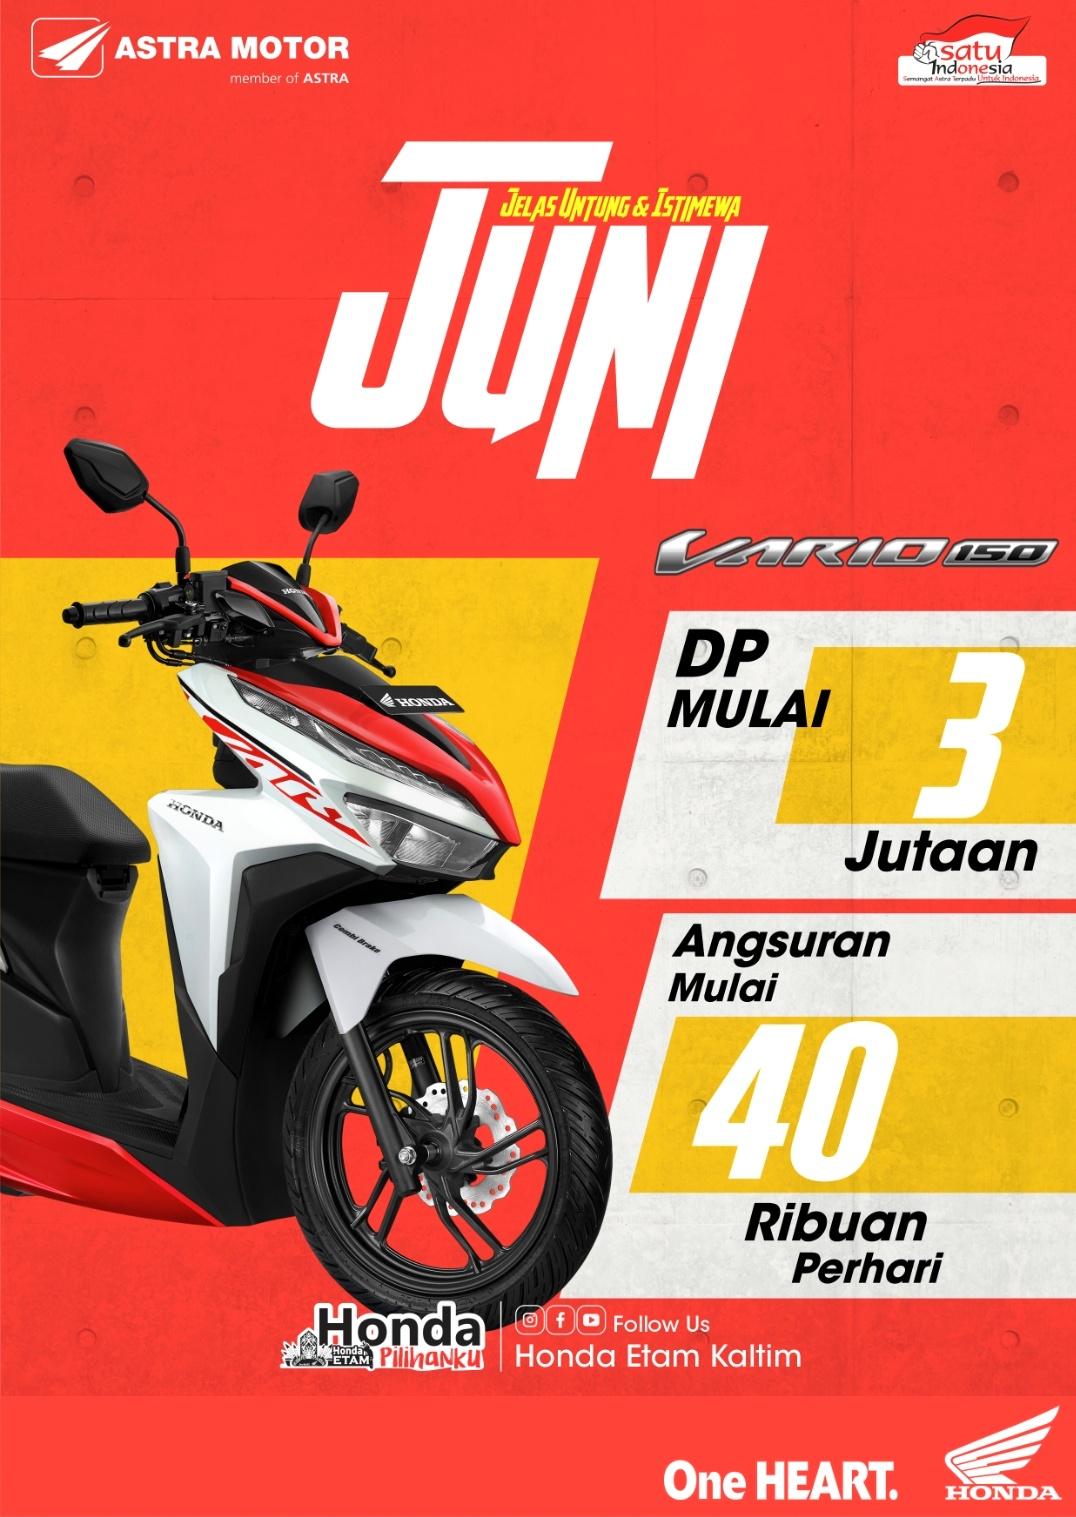 Promo Astra Motor Kaltim 2 Jelas Untung & Istimewa Juni